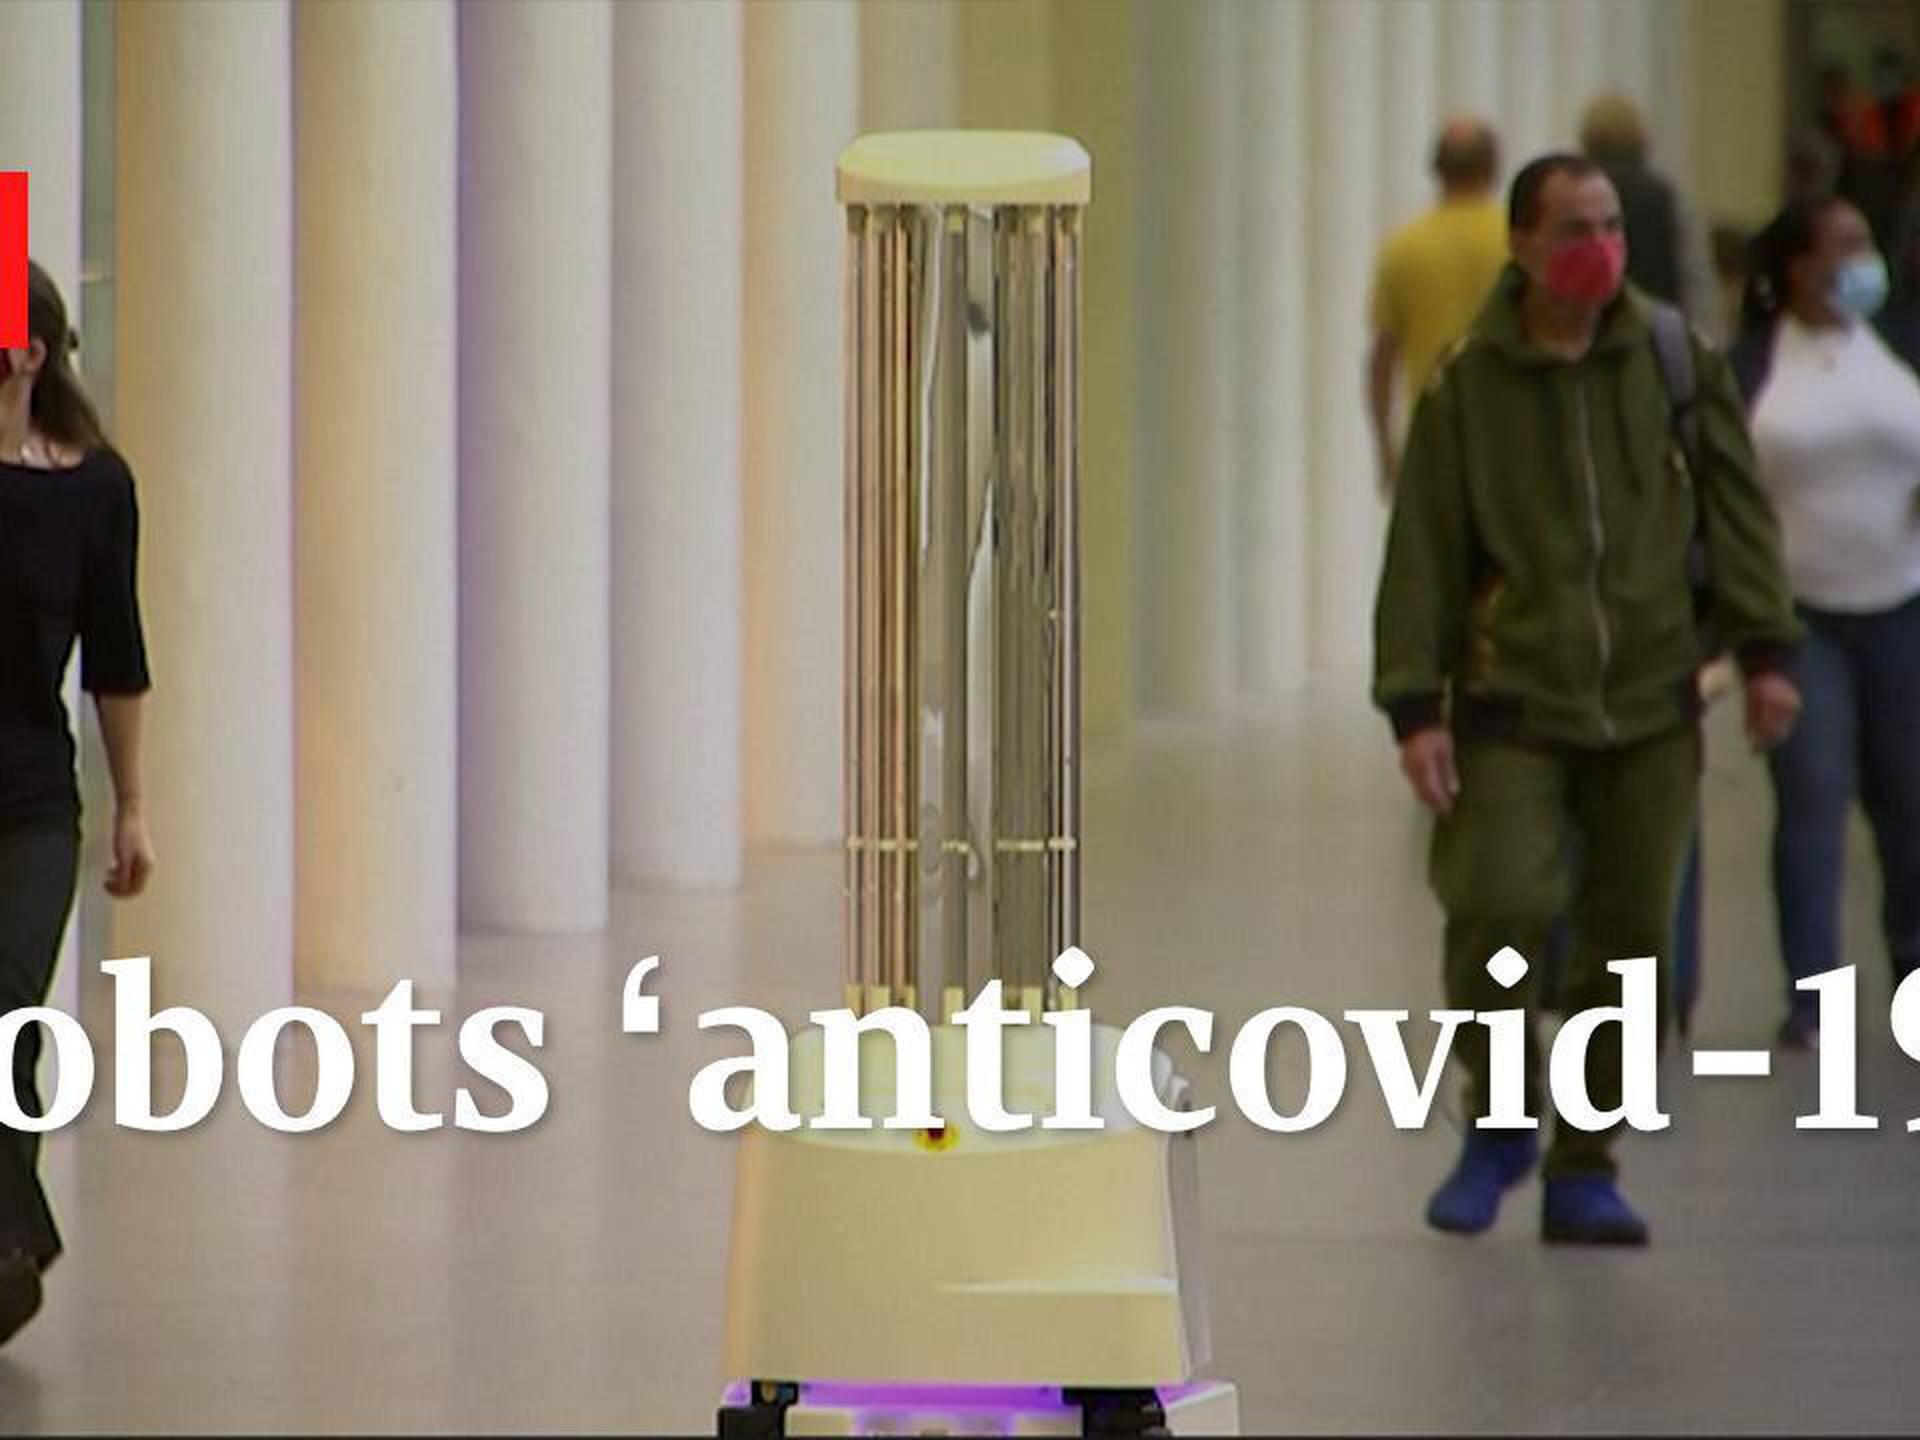 Robots 'anticovid-19'